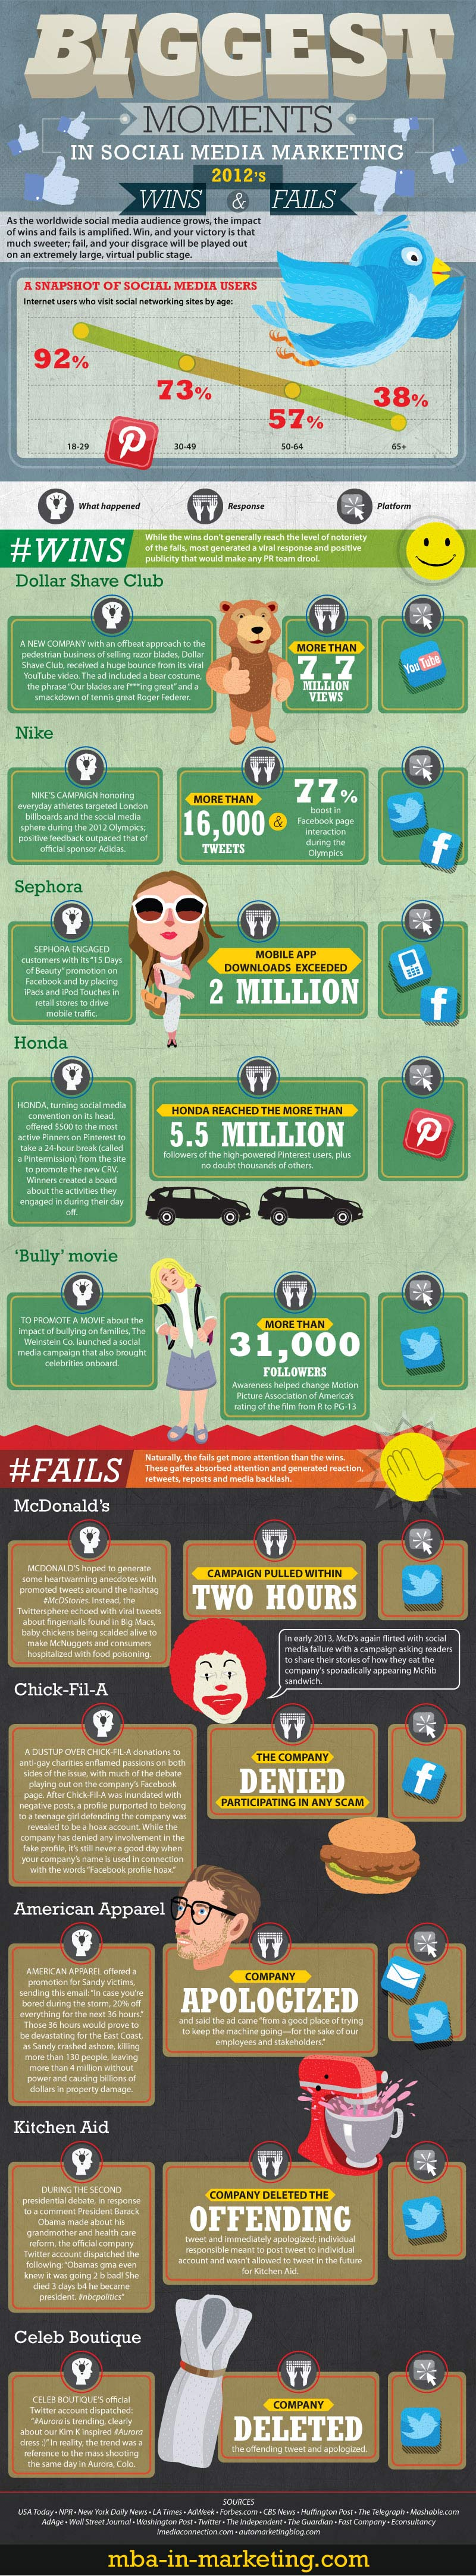 social-media-fails-infographic.jpg